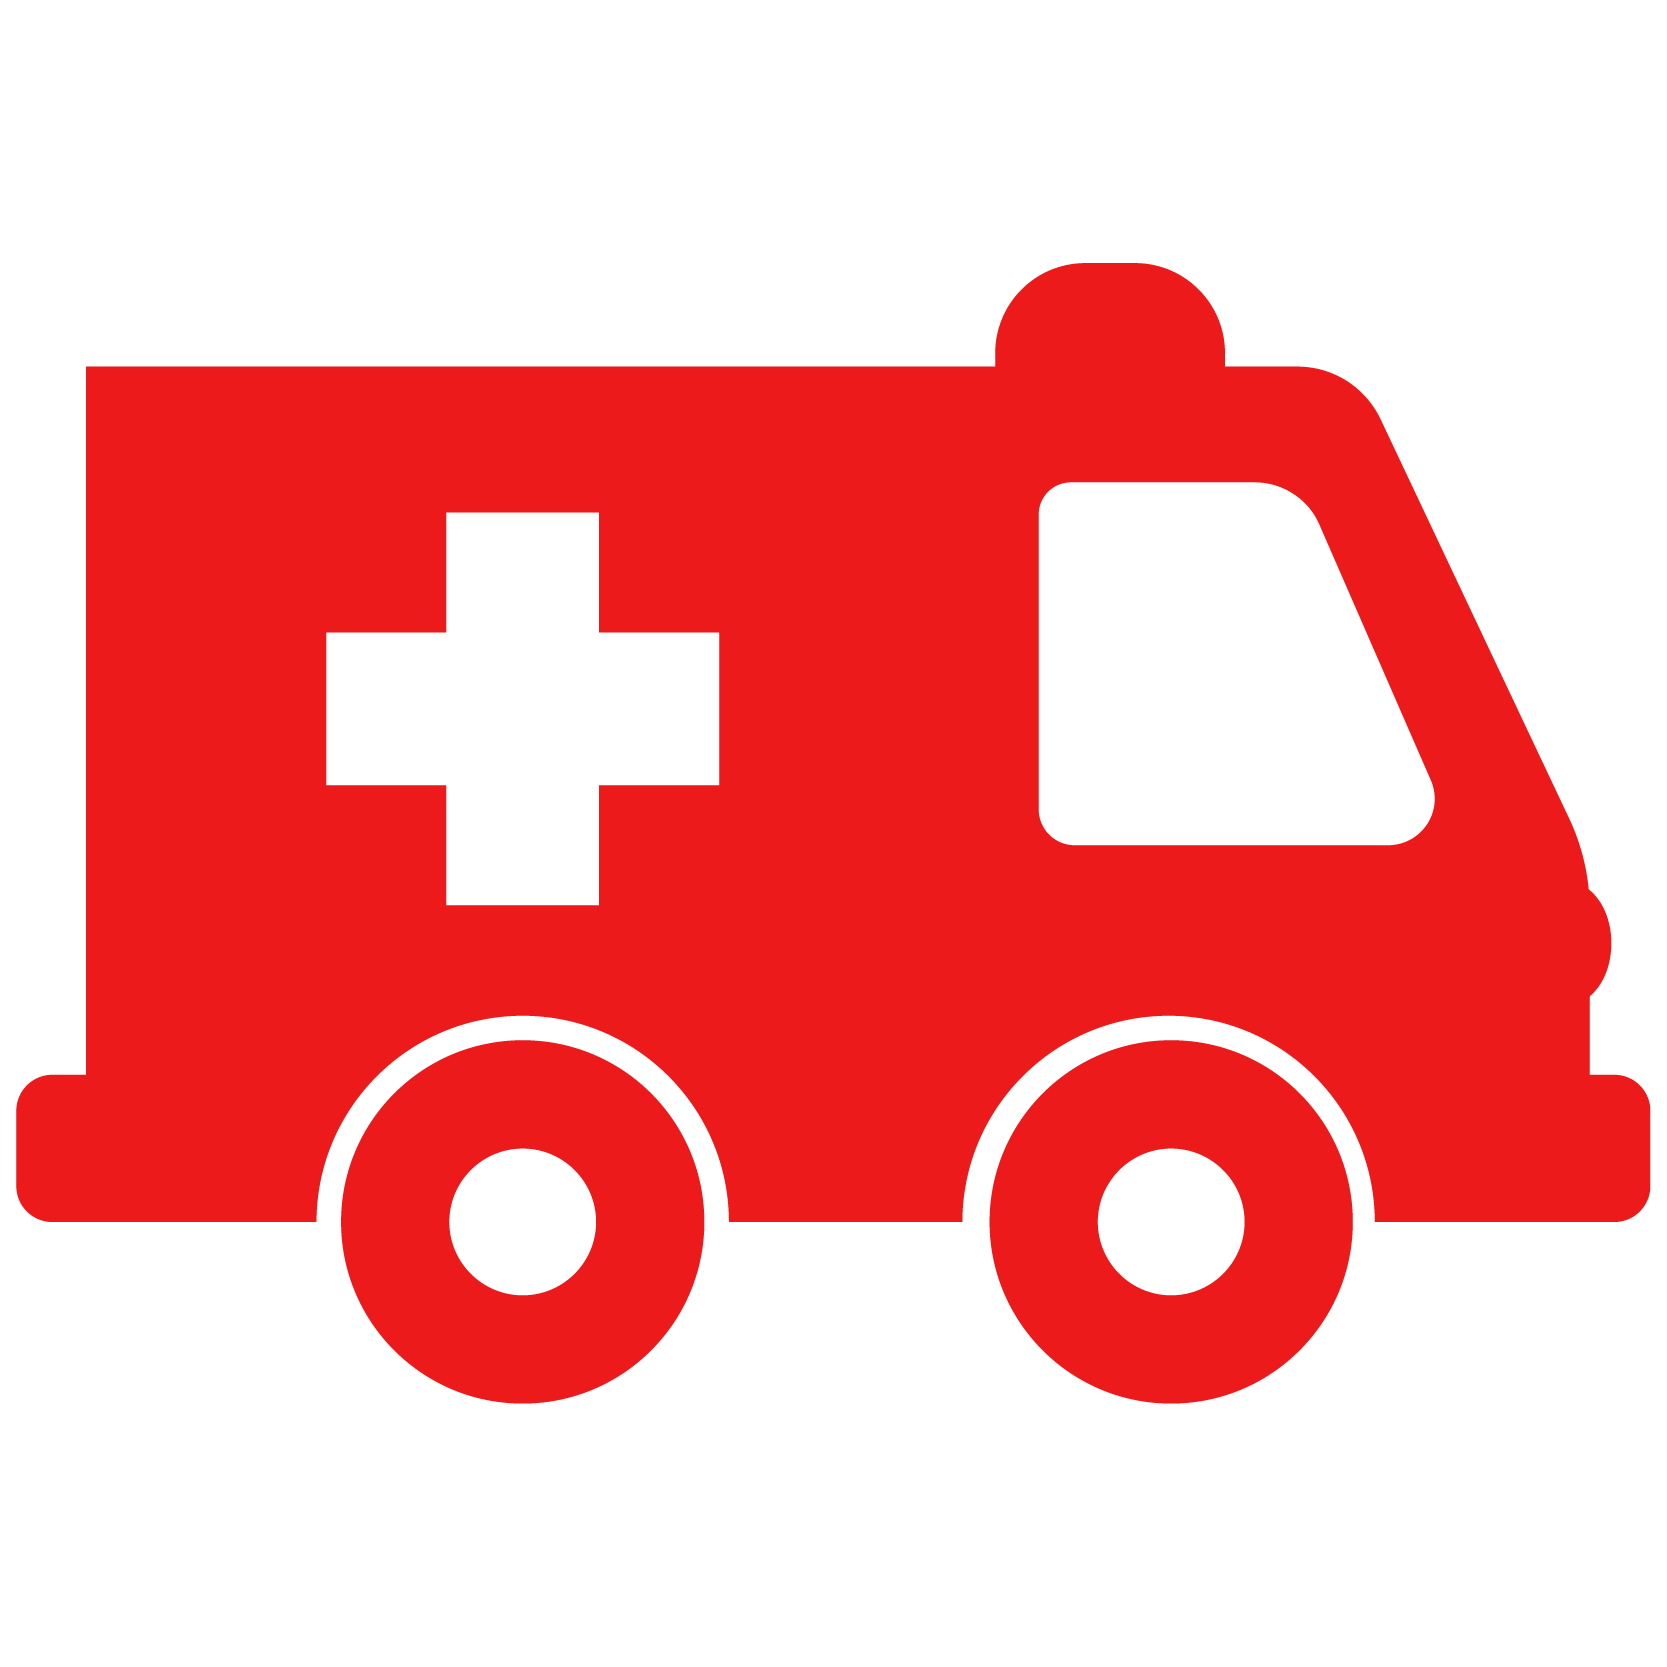 emergency clipart community vehicle